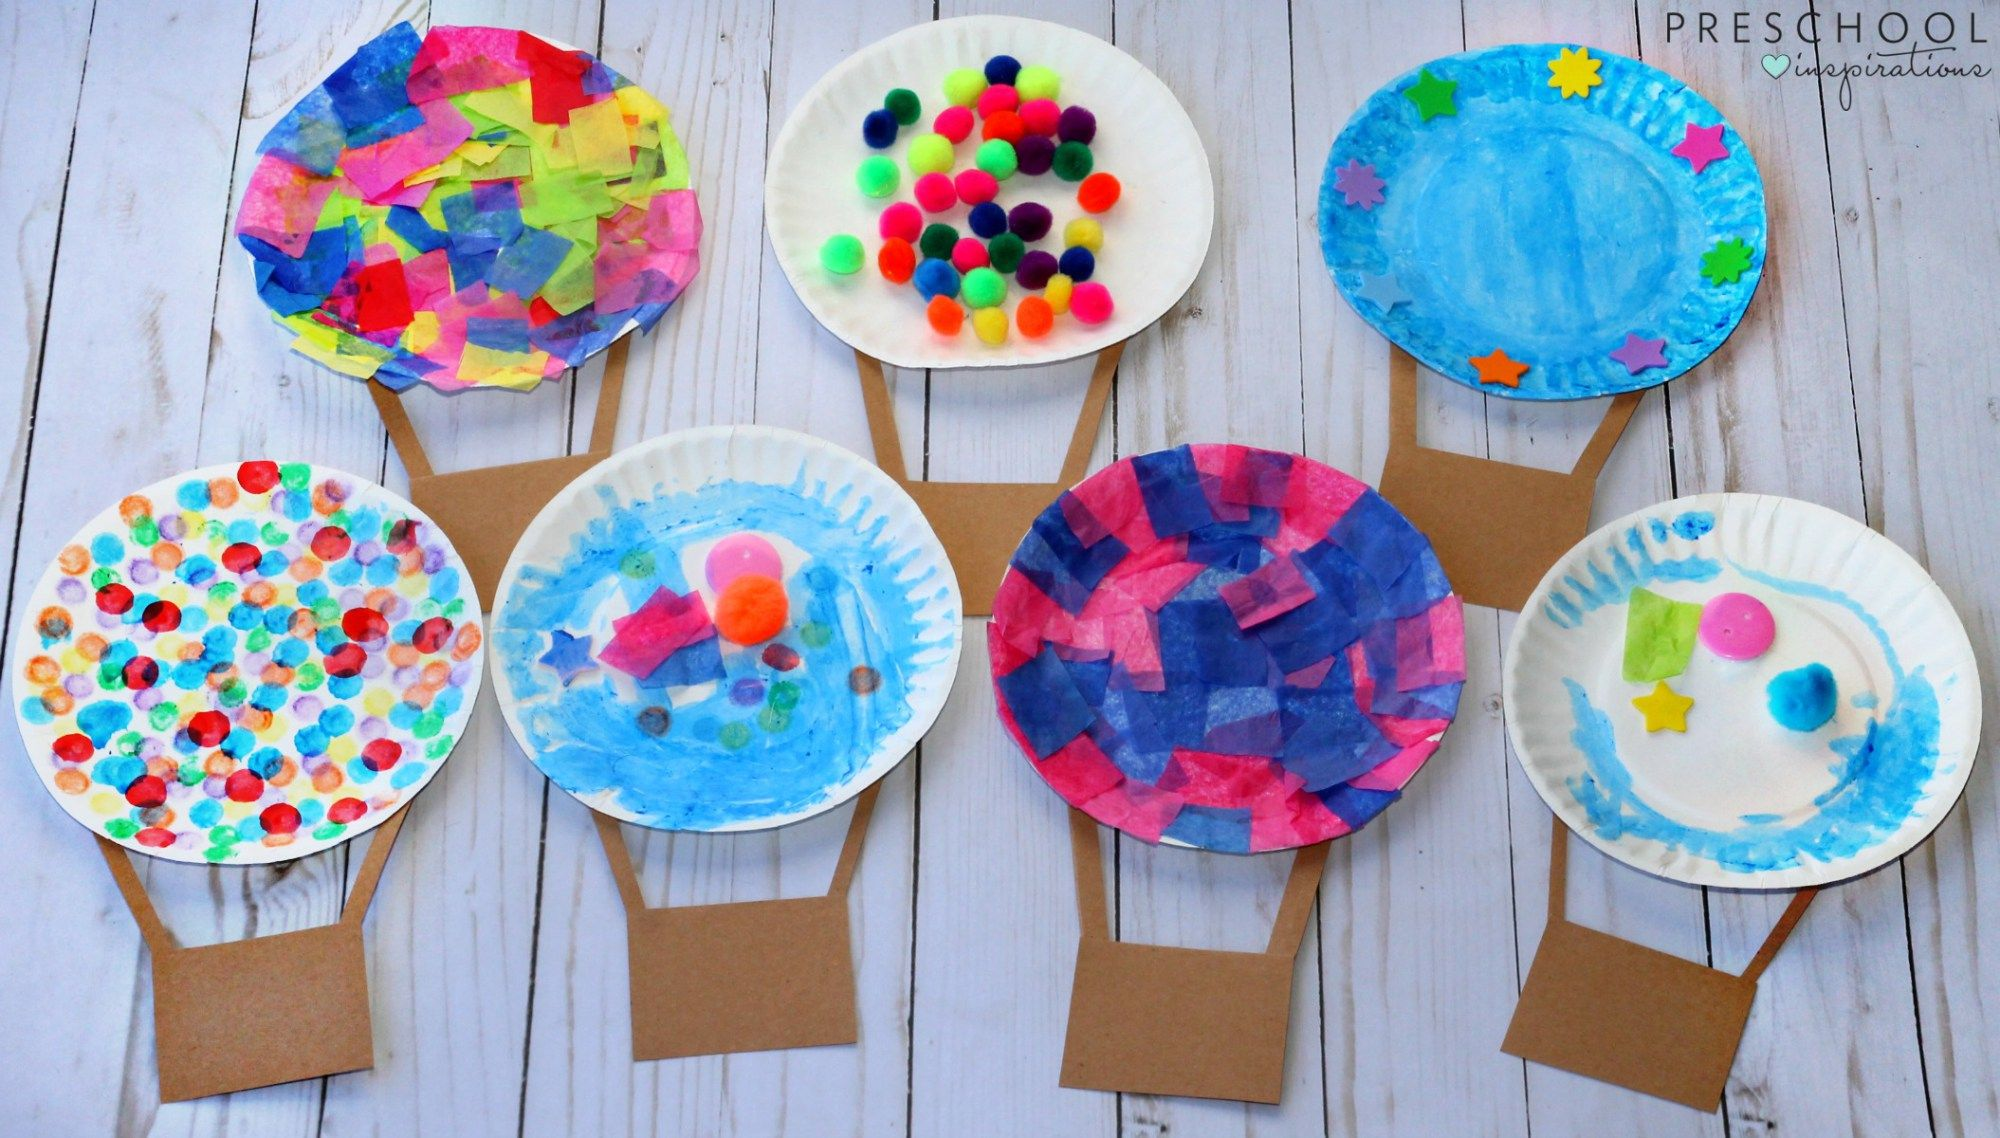 Hot Air Balloon Process Art Activity